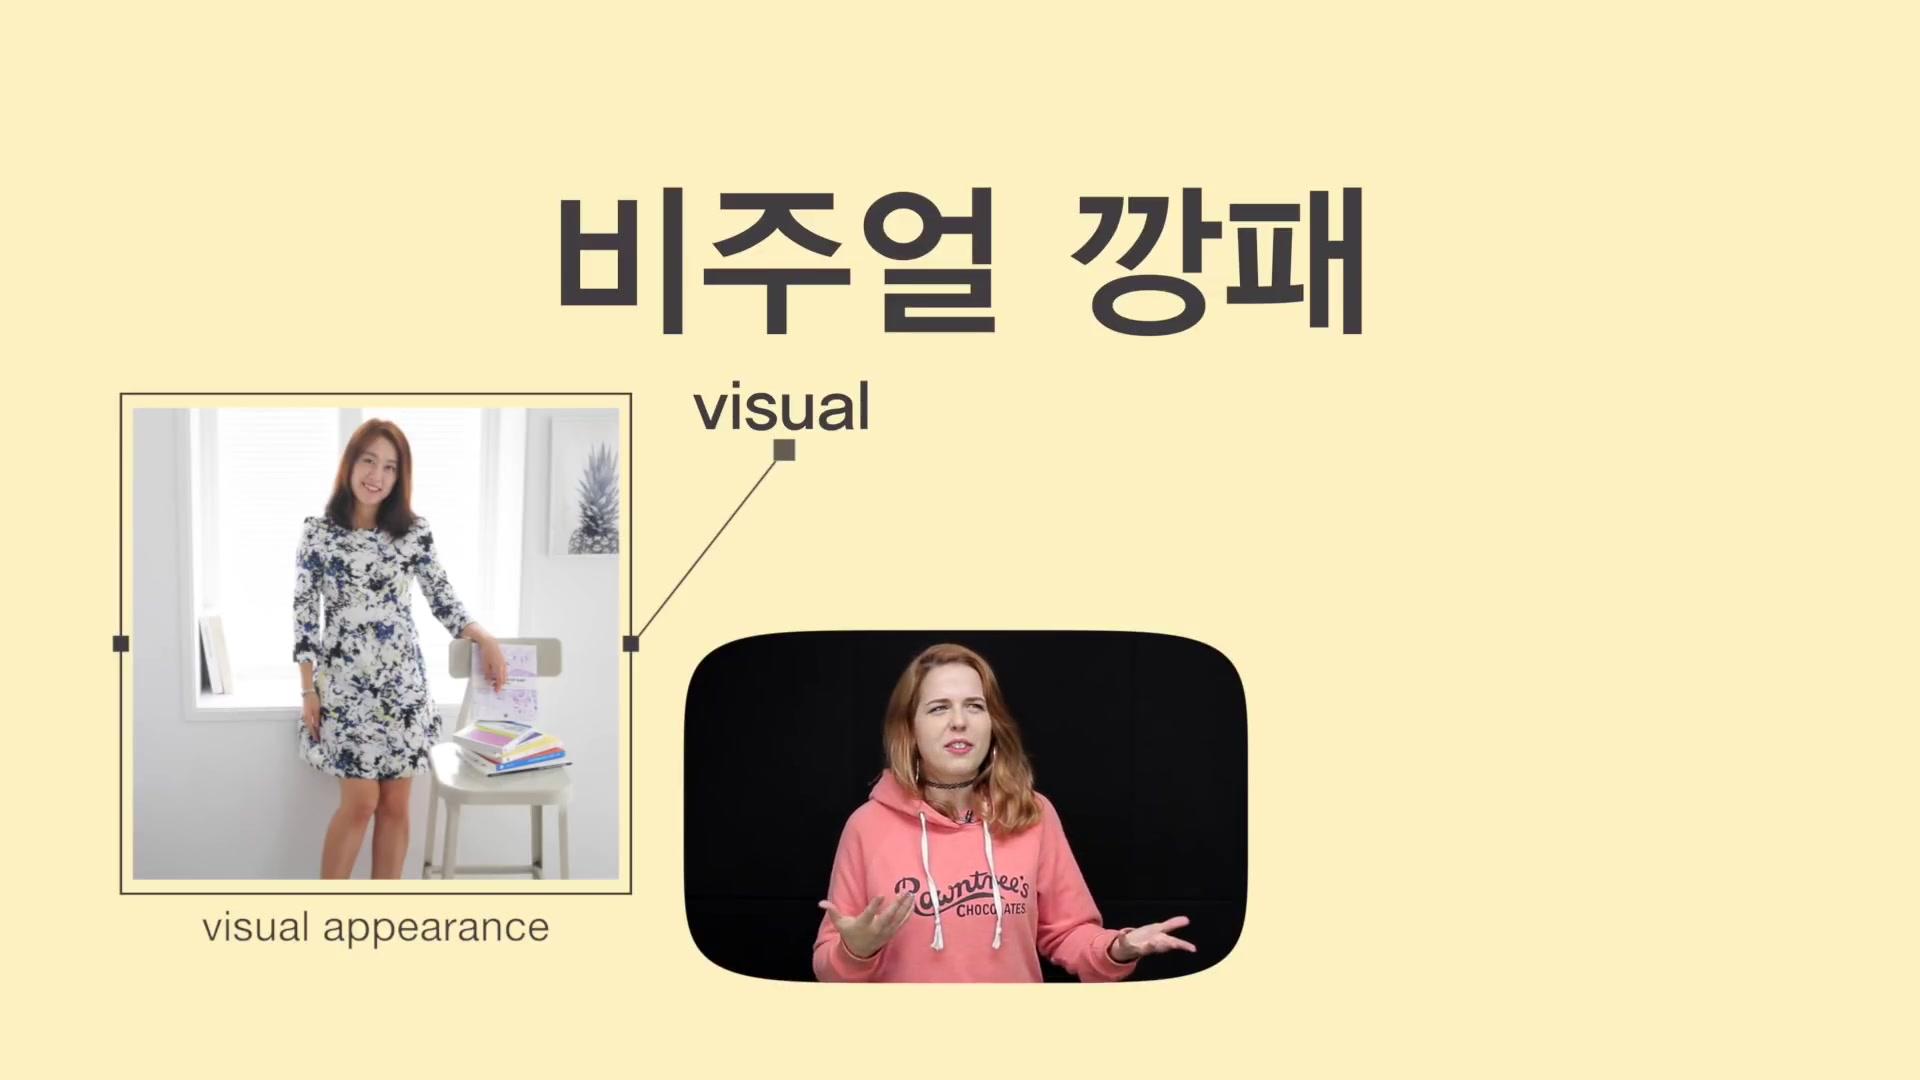 TalkToMeInKorean Episode 123: Korean Buzzwords: 비주얼 깡패 (Visual + Bully?)